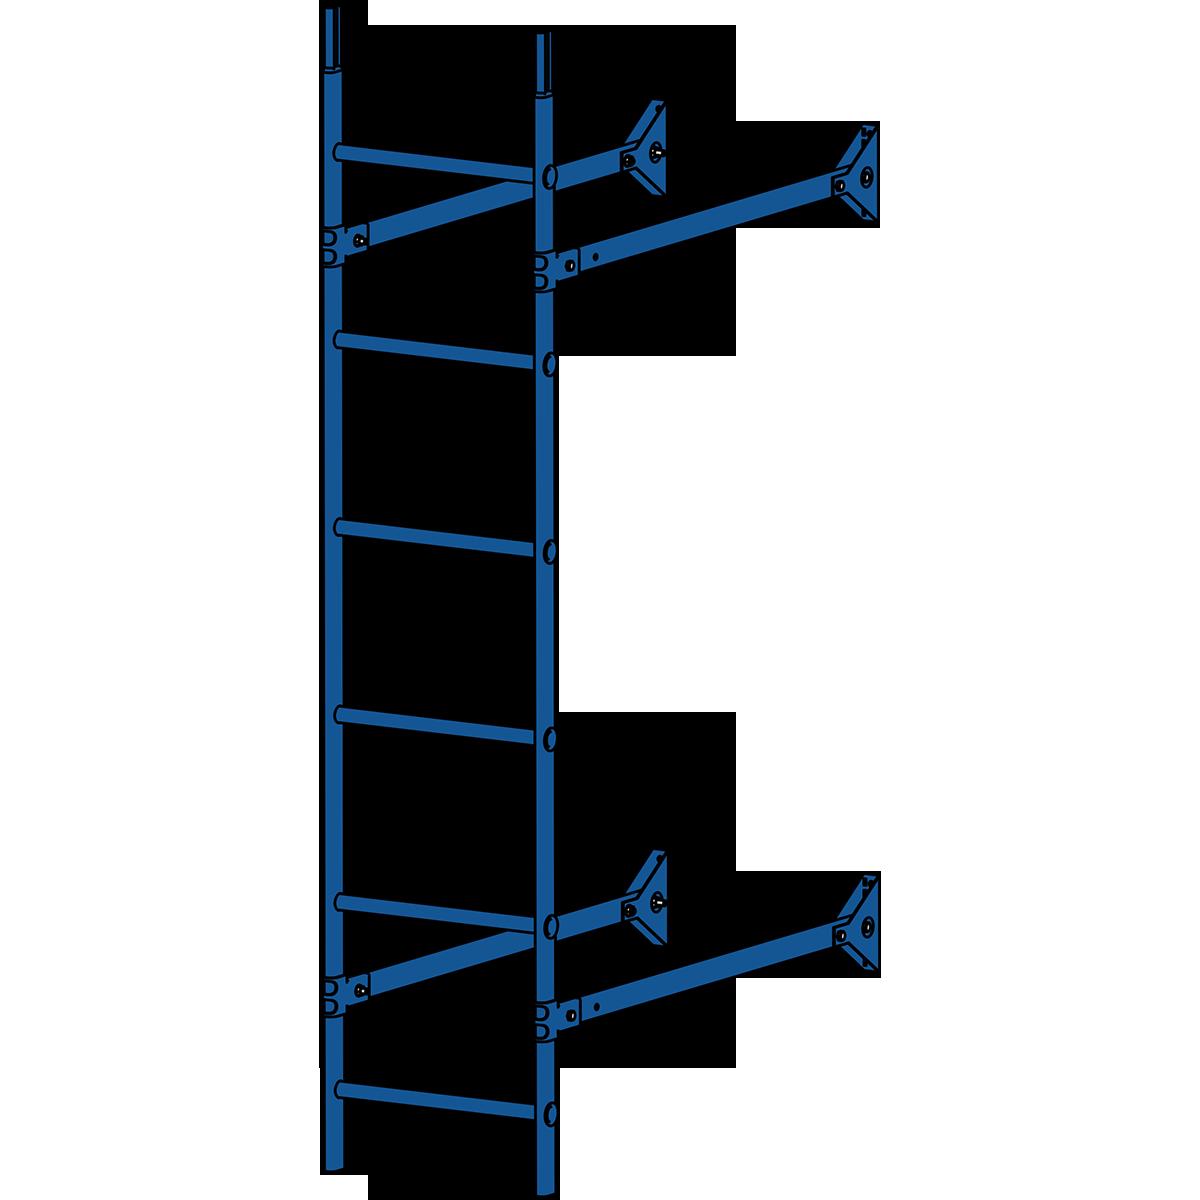 Лестница стеновая ROOFSYSTEMS ELITE 400 1,8 м RAL 5005 Синий насыщенный